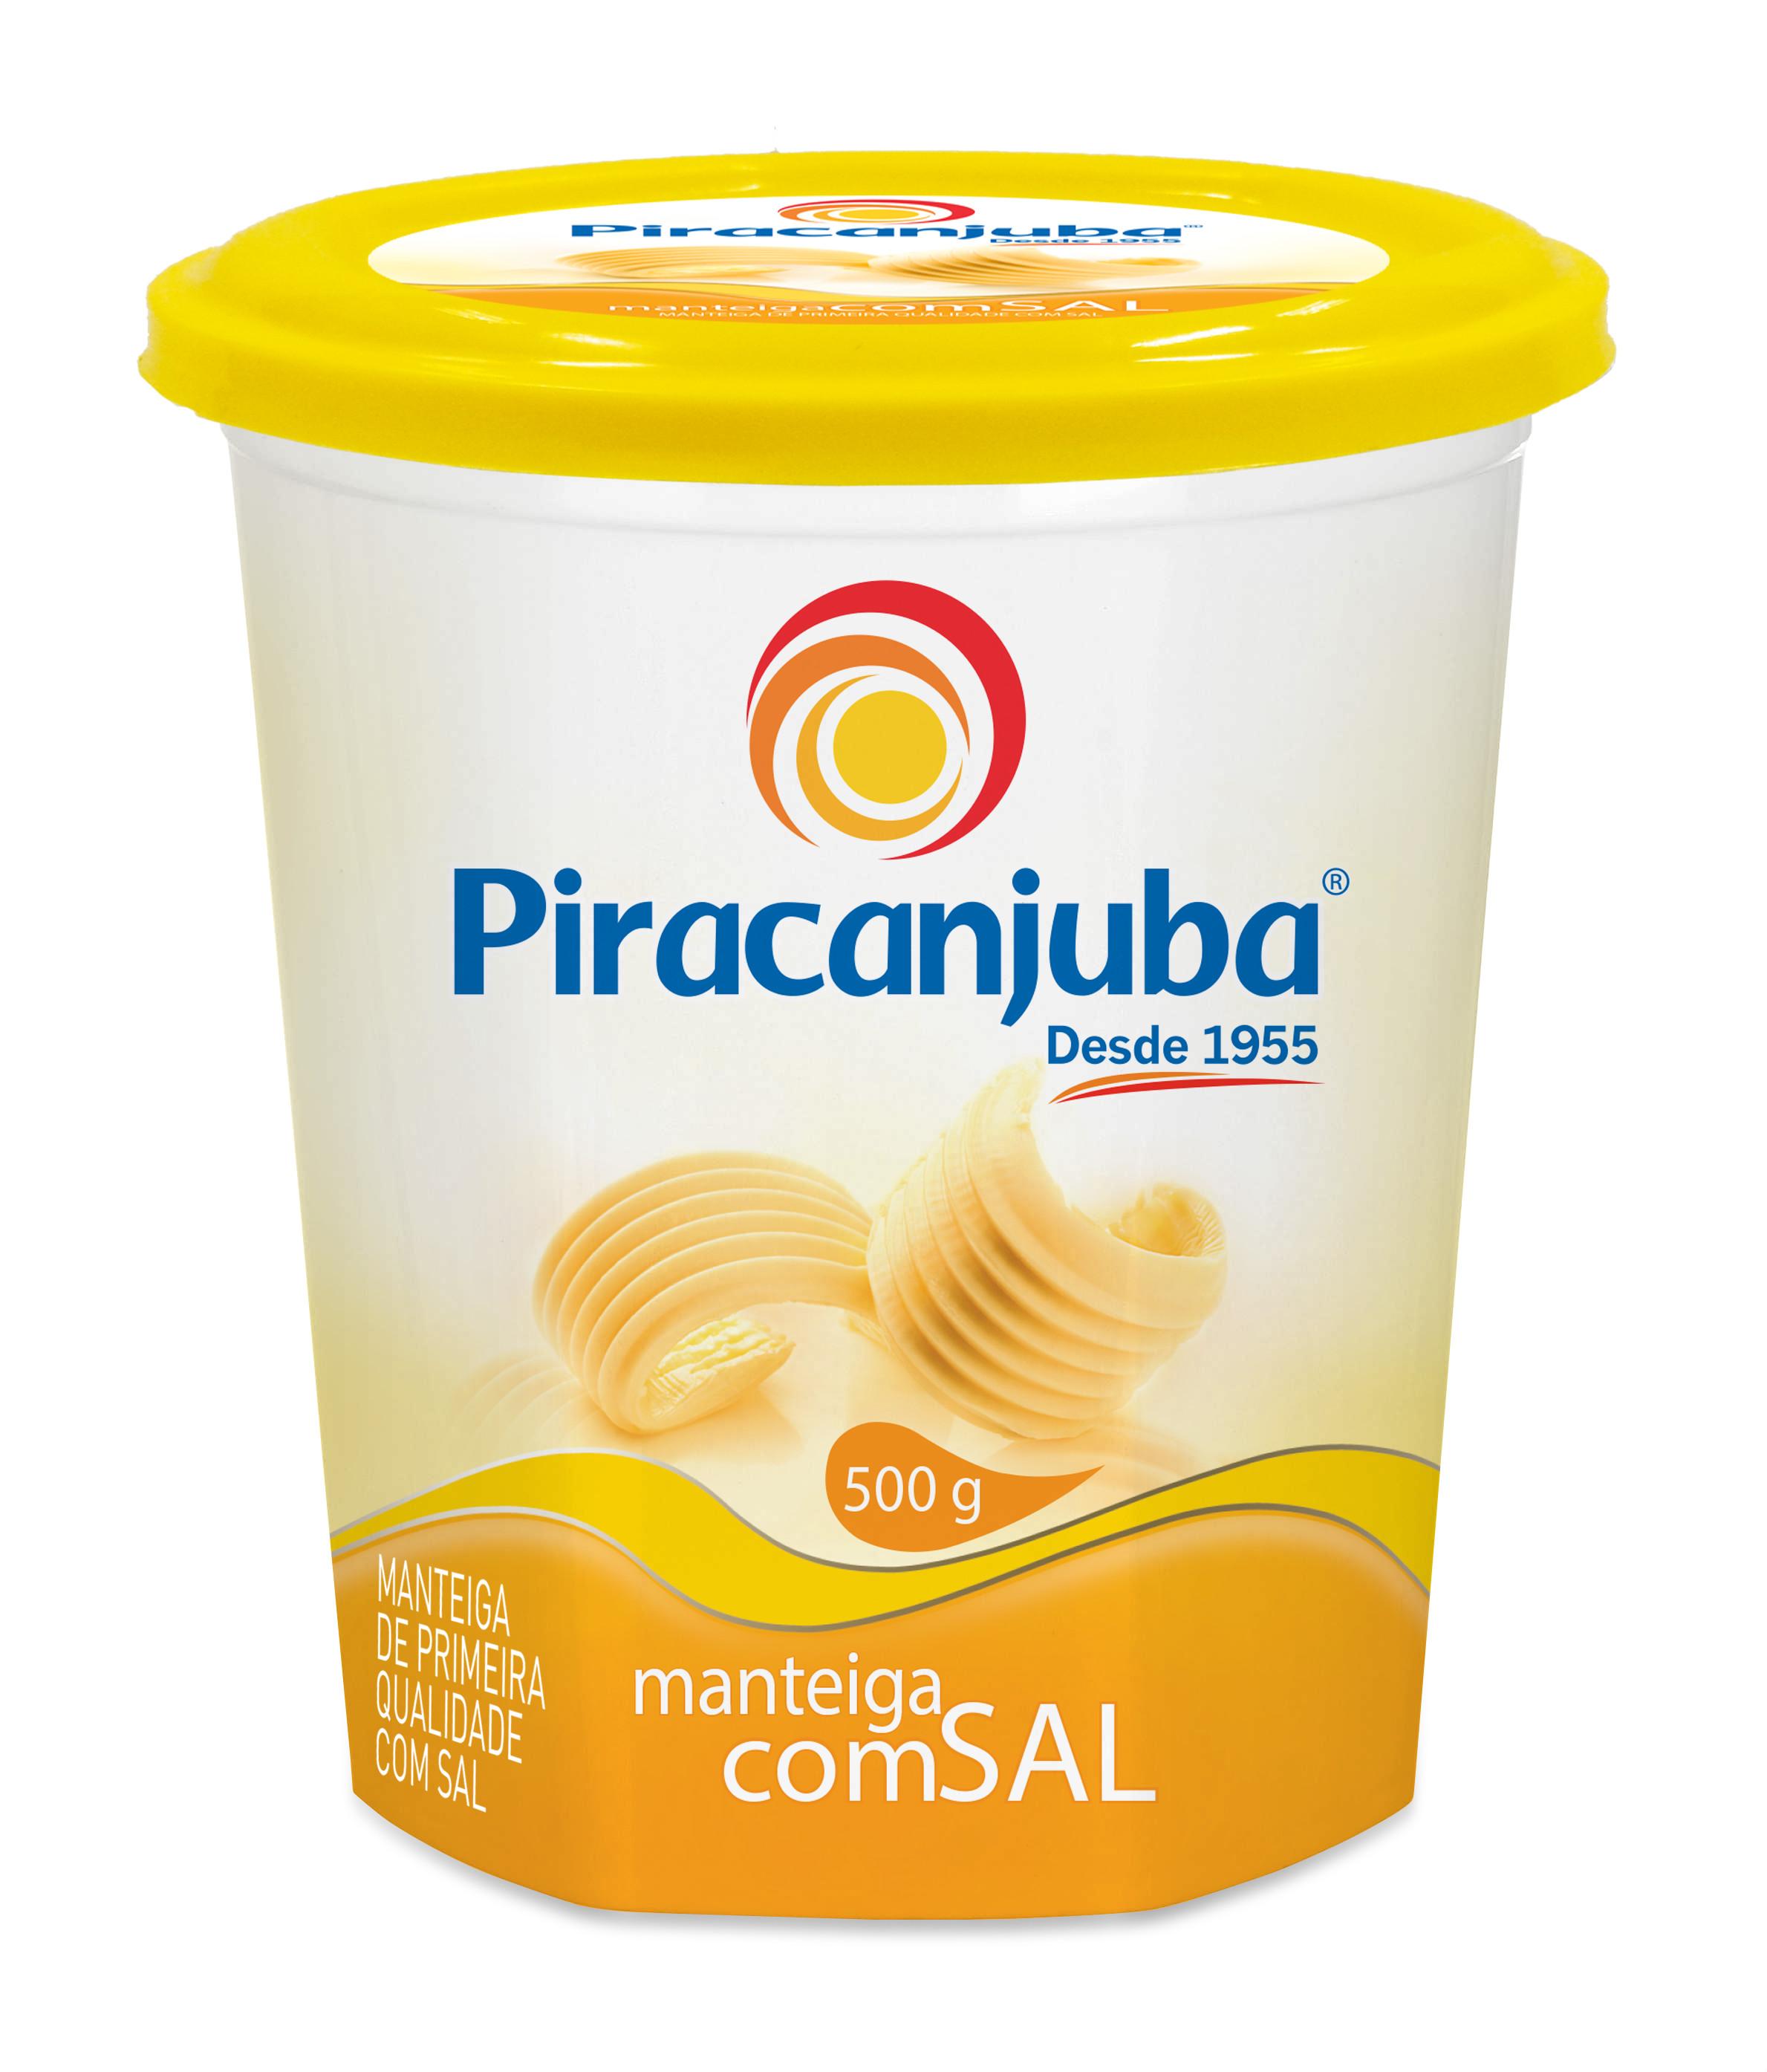 Manteiga com sal Piracanjuba pote 500g.